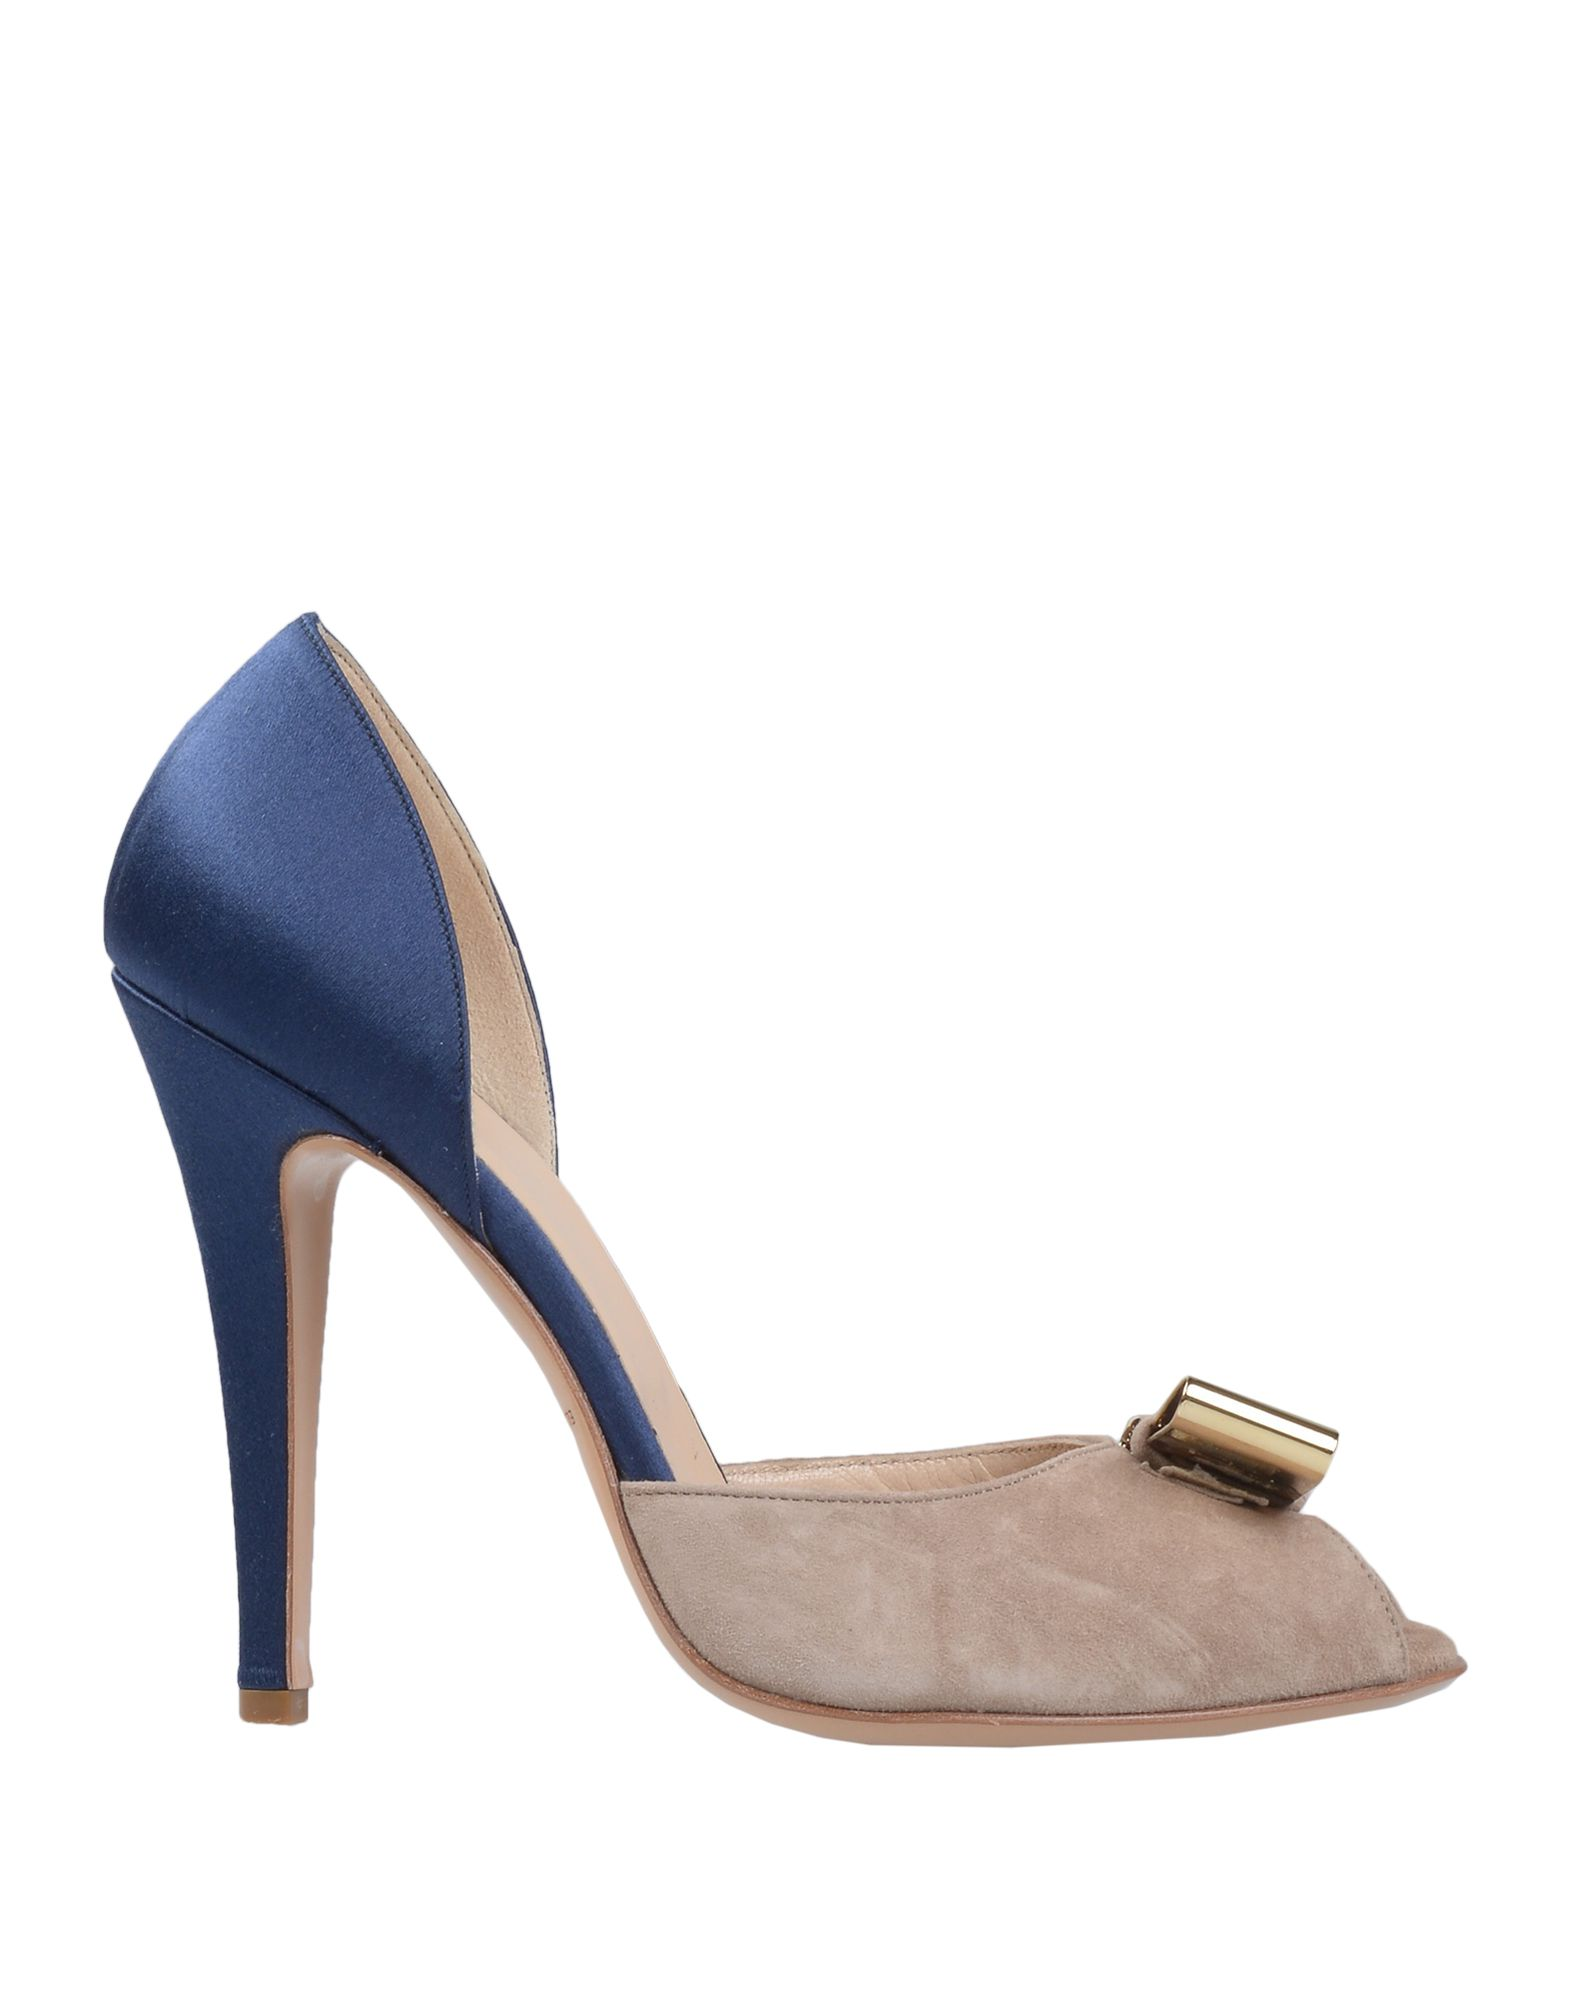 Elisabetta Franchi Pumps Pumps Pumps Damen 44602090QOGut aussehende strapazierfähige Schuhe 64374d